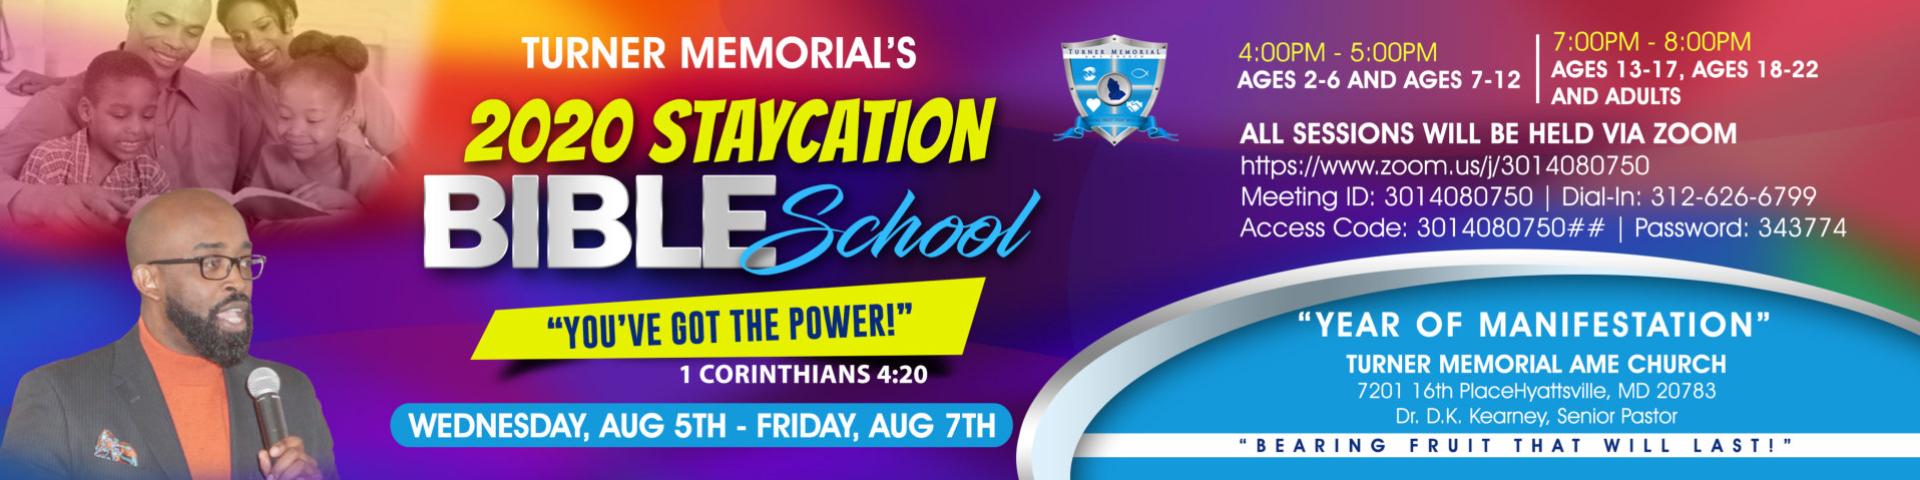 2020 Staycation Bible School banner